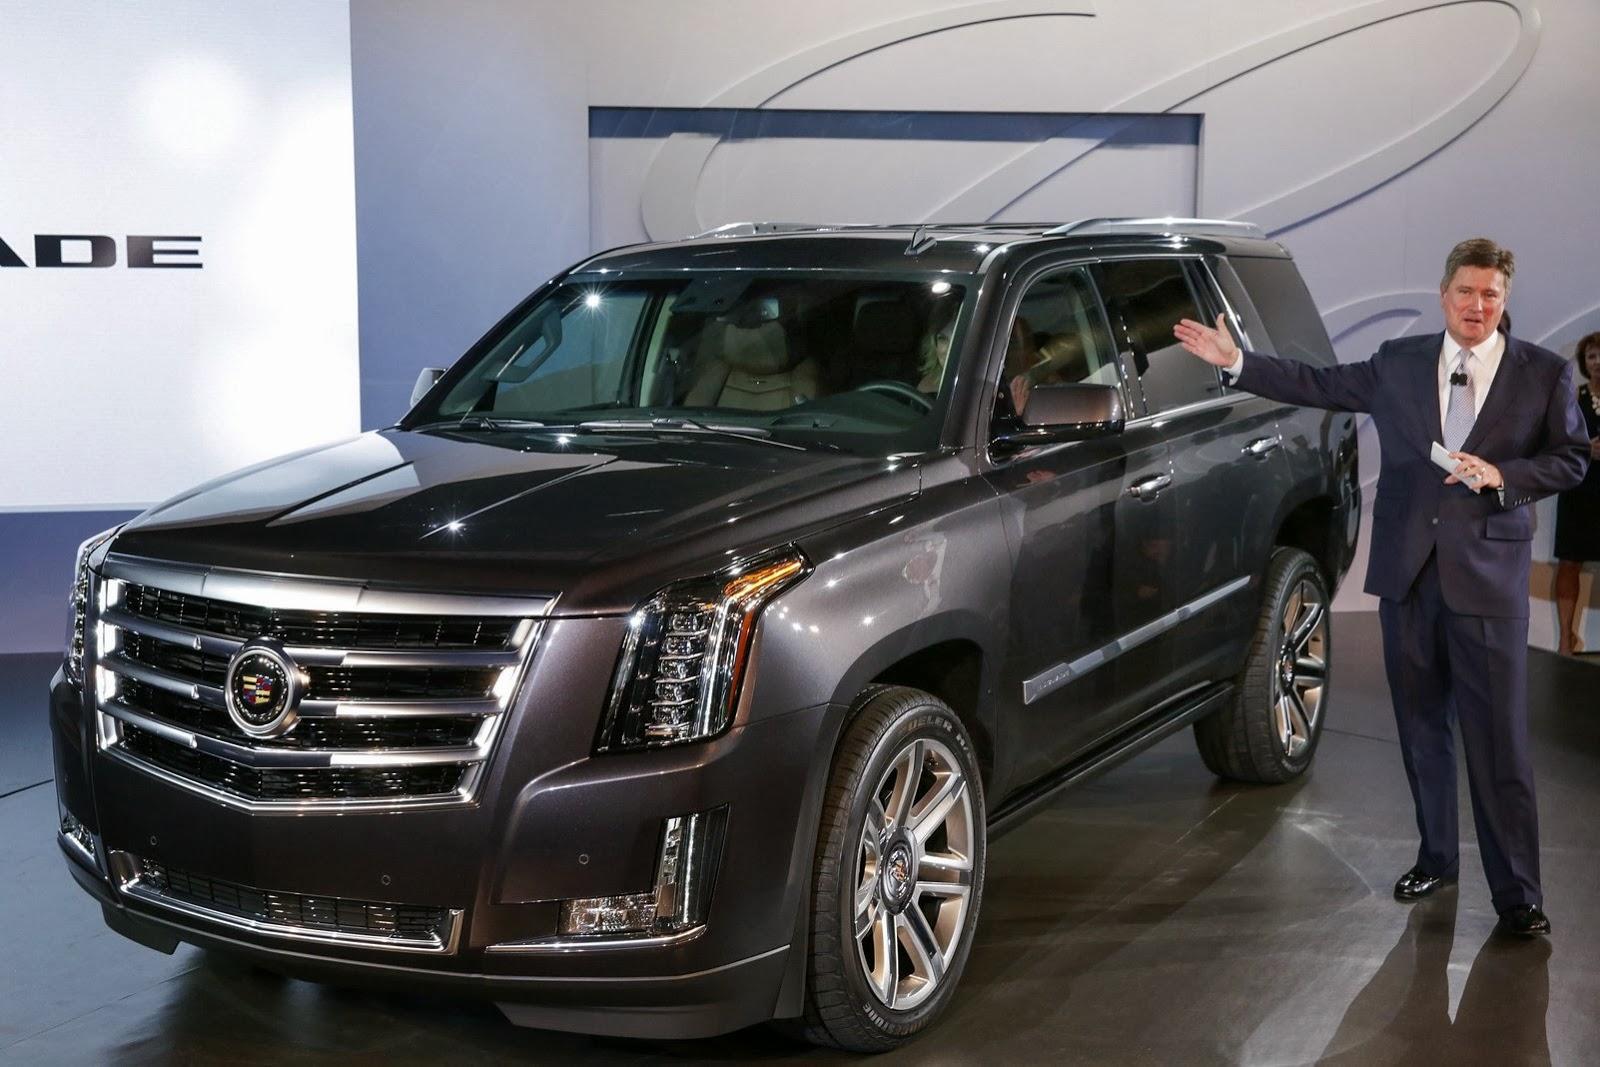 2015 Cadillac Escalade Officially Revealed Autoevolution